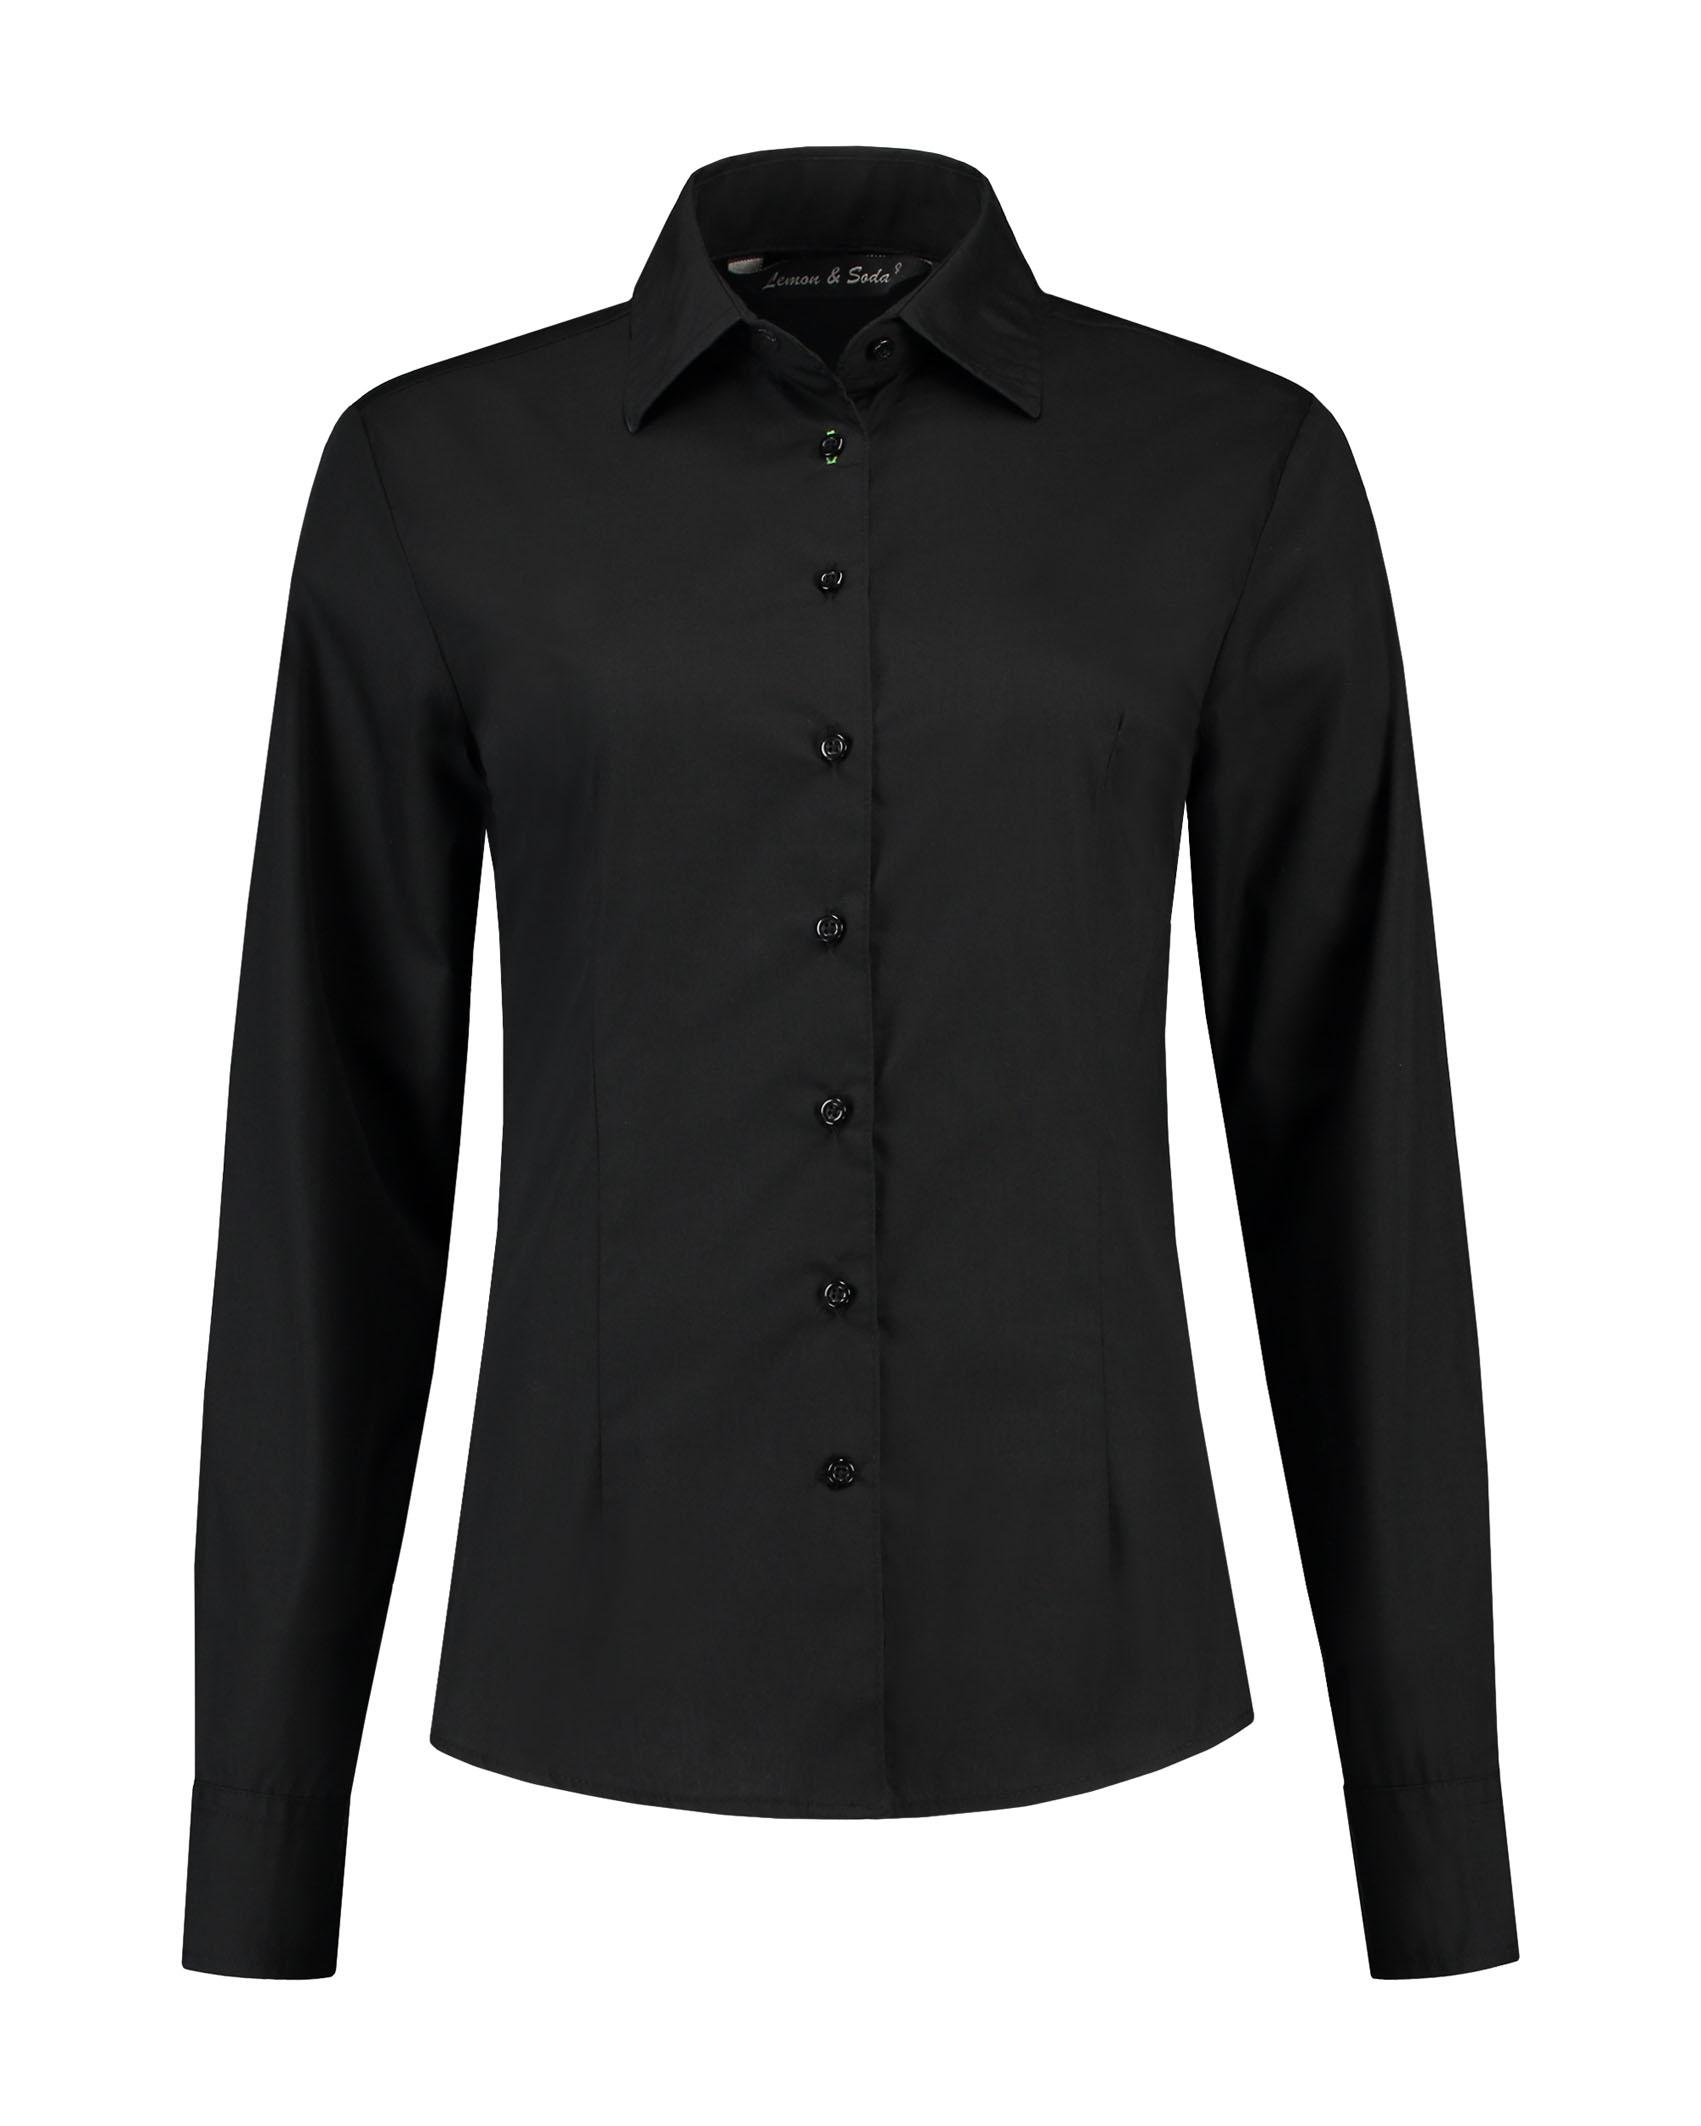 L&S Shirt Poplin Mix LS for her